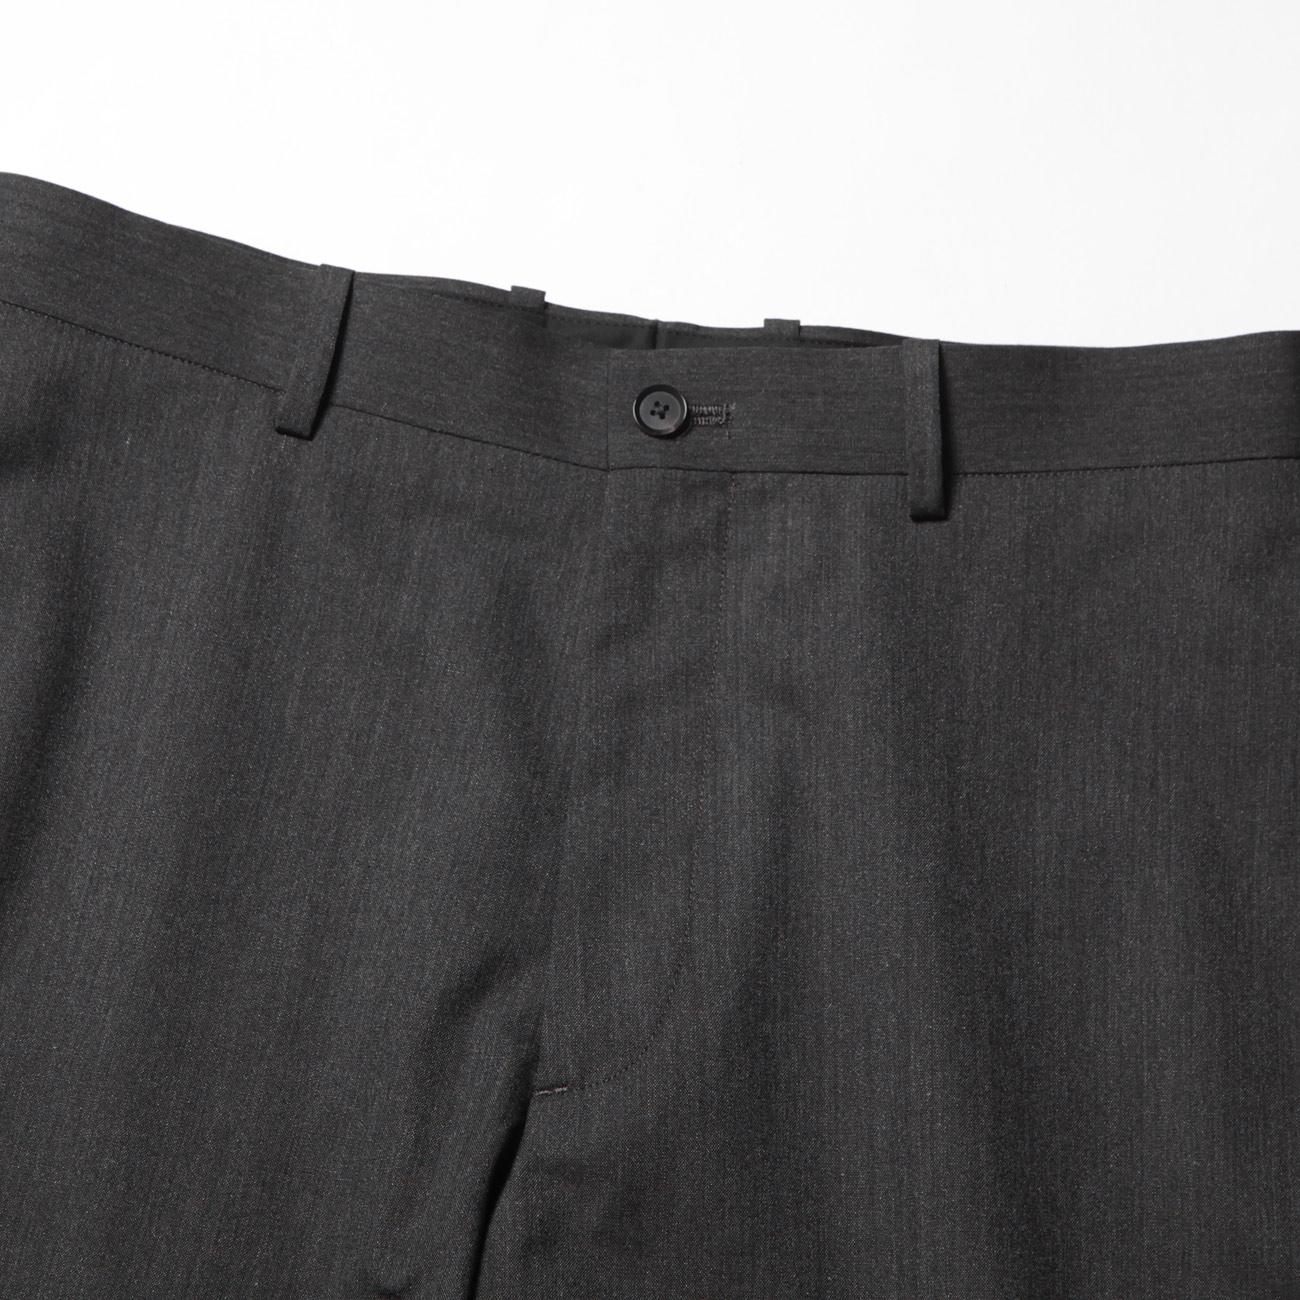 AURALEE オーラリー WOOL SILK TROPICAL SLACKS - Charcoal Black